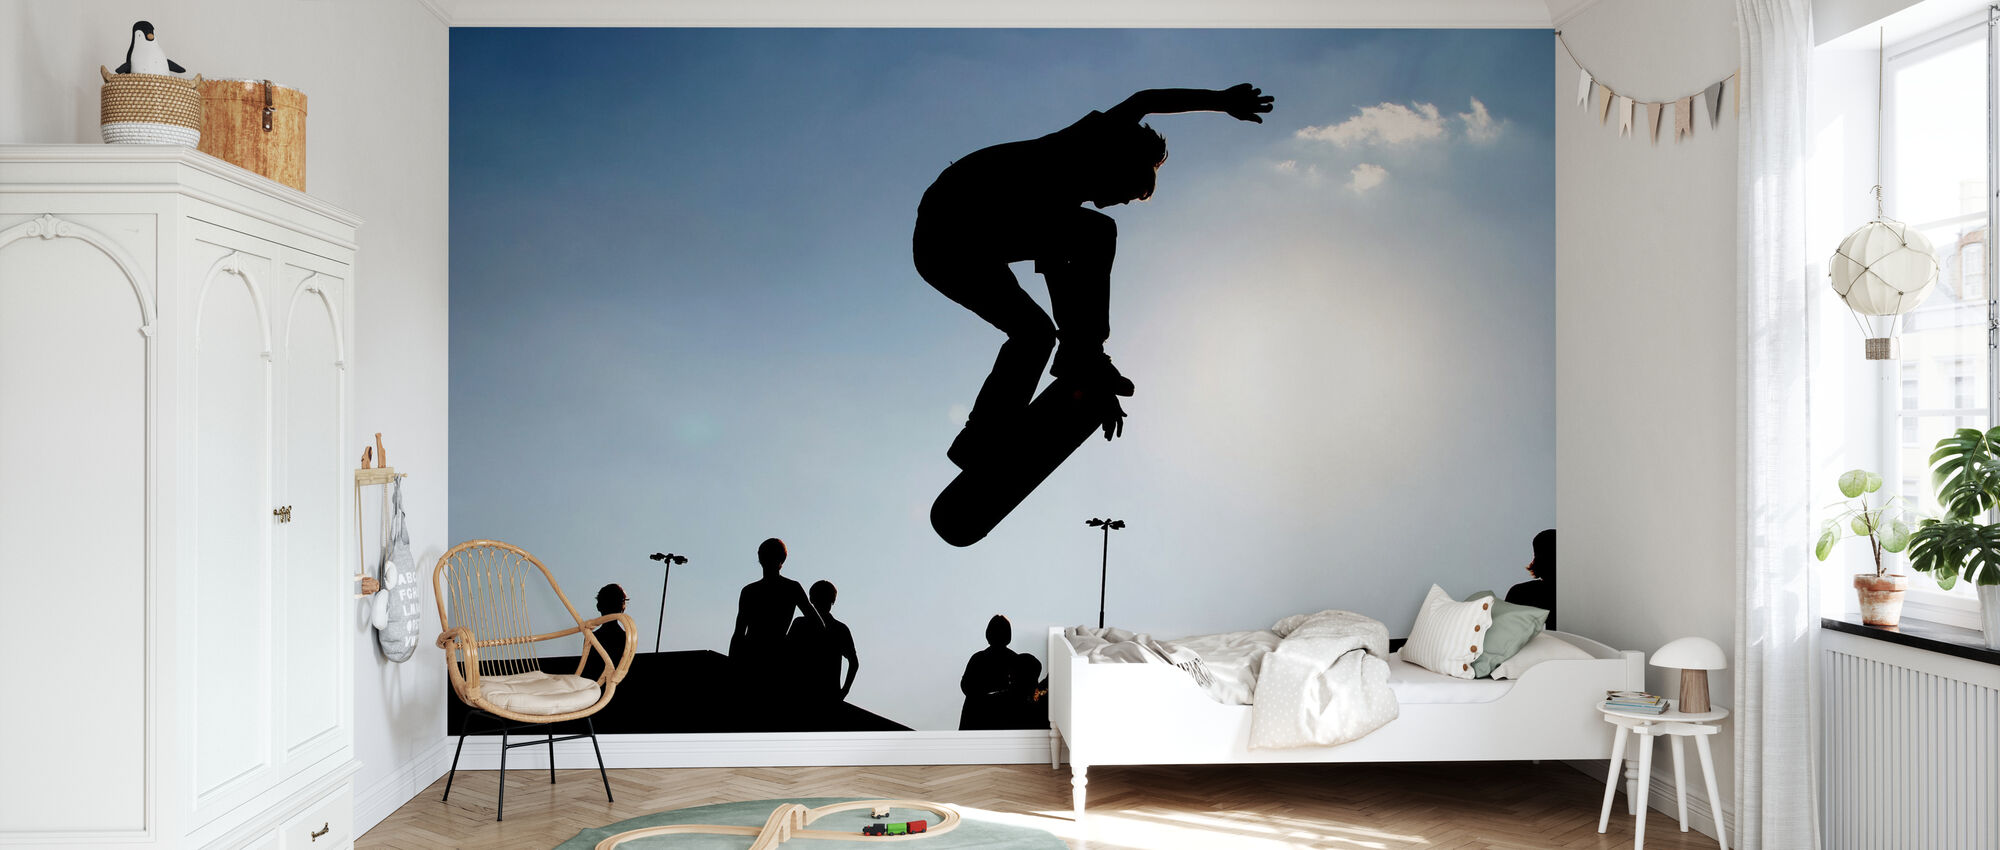 Skateboard Jump - Wallpaper - Kids Room